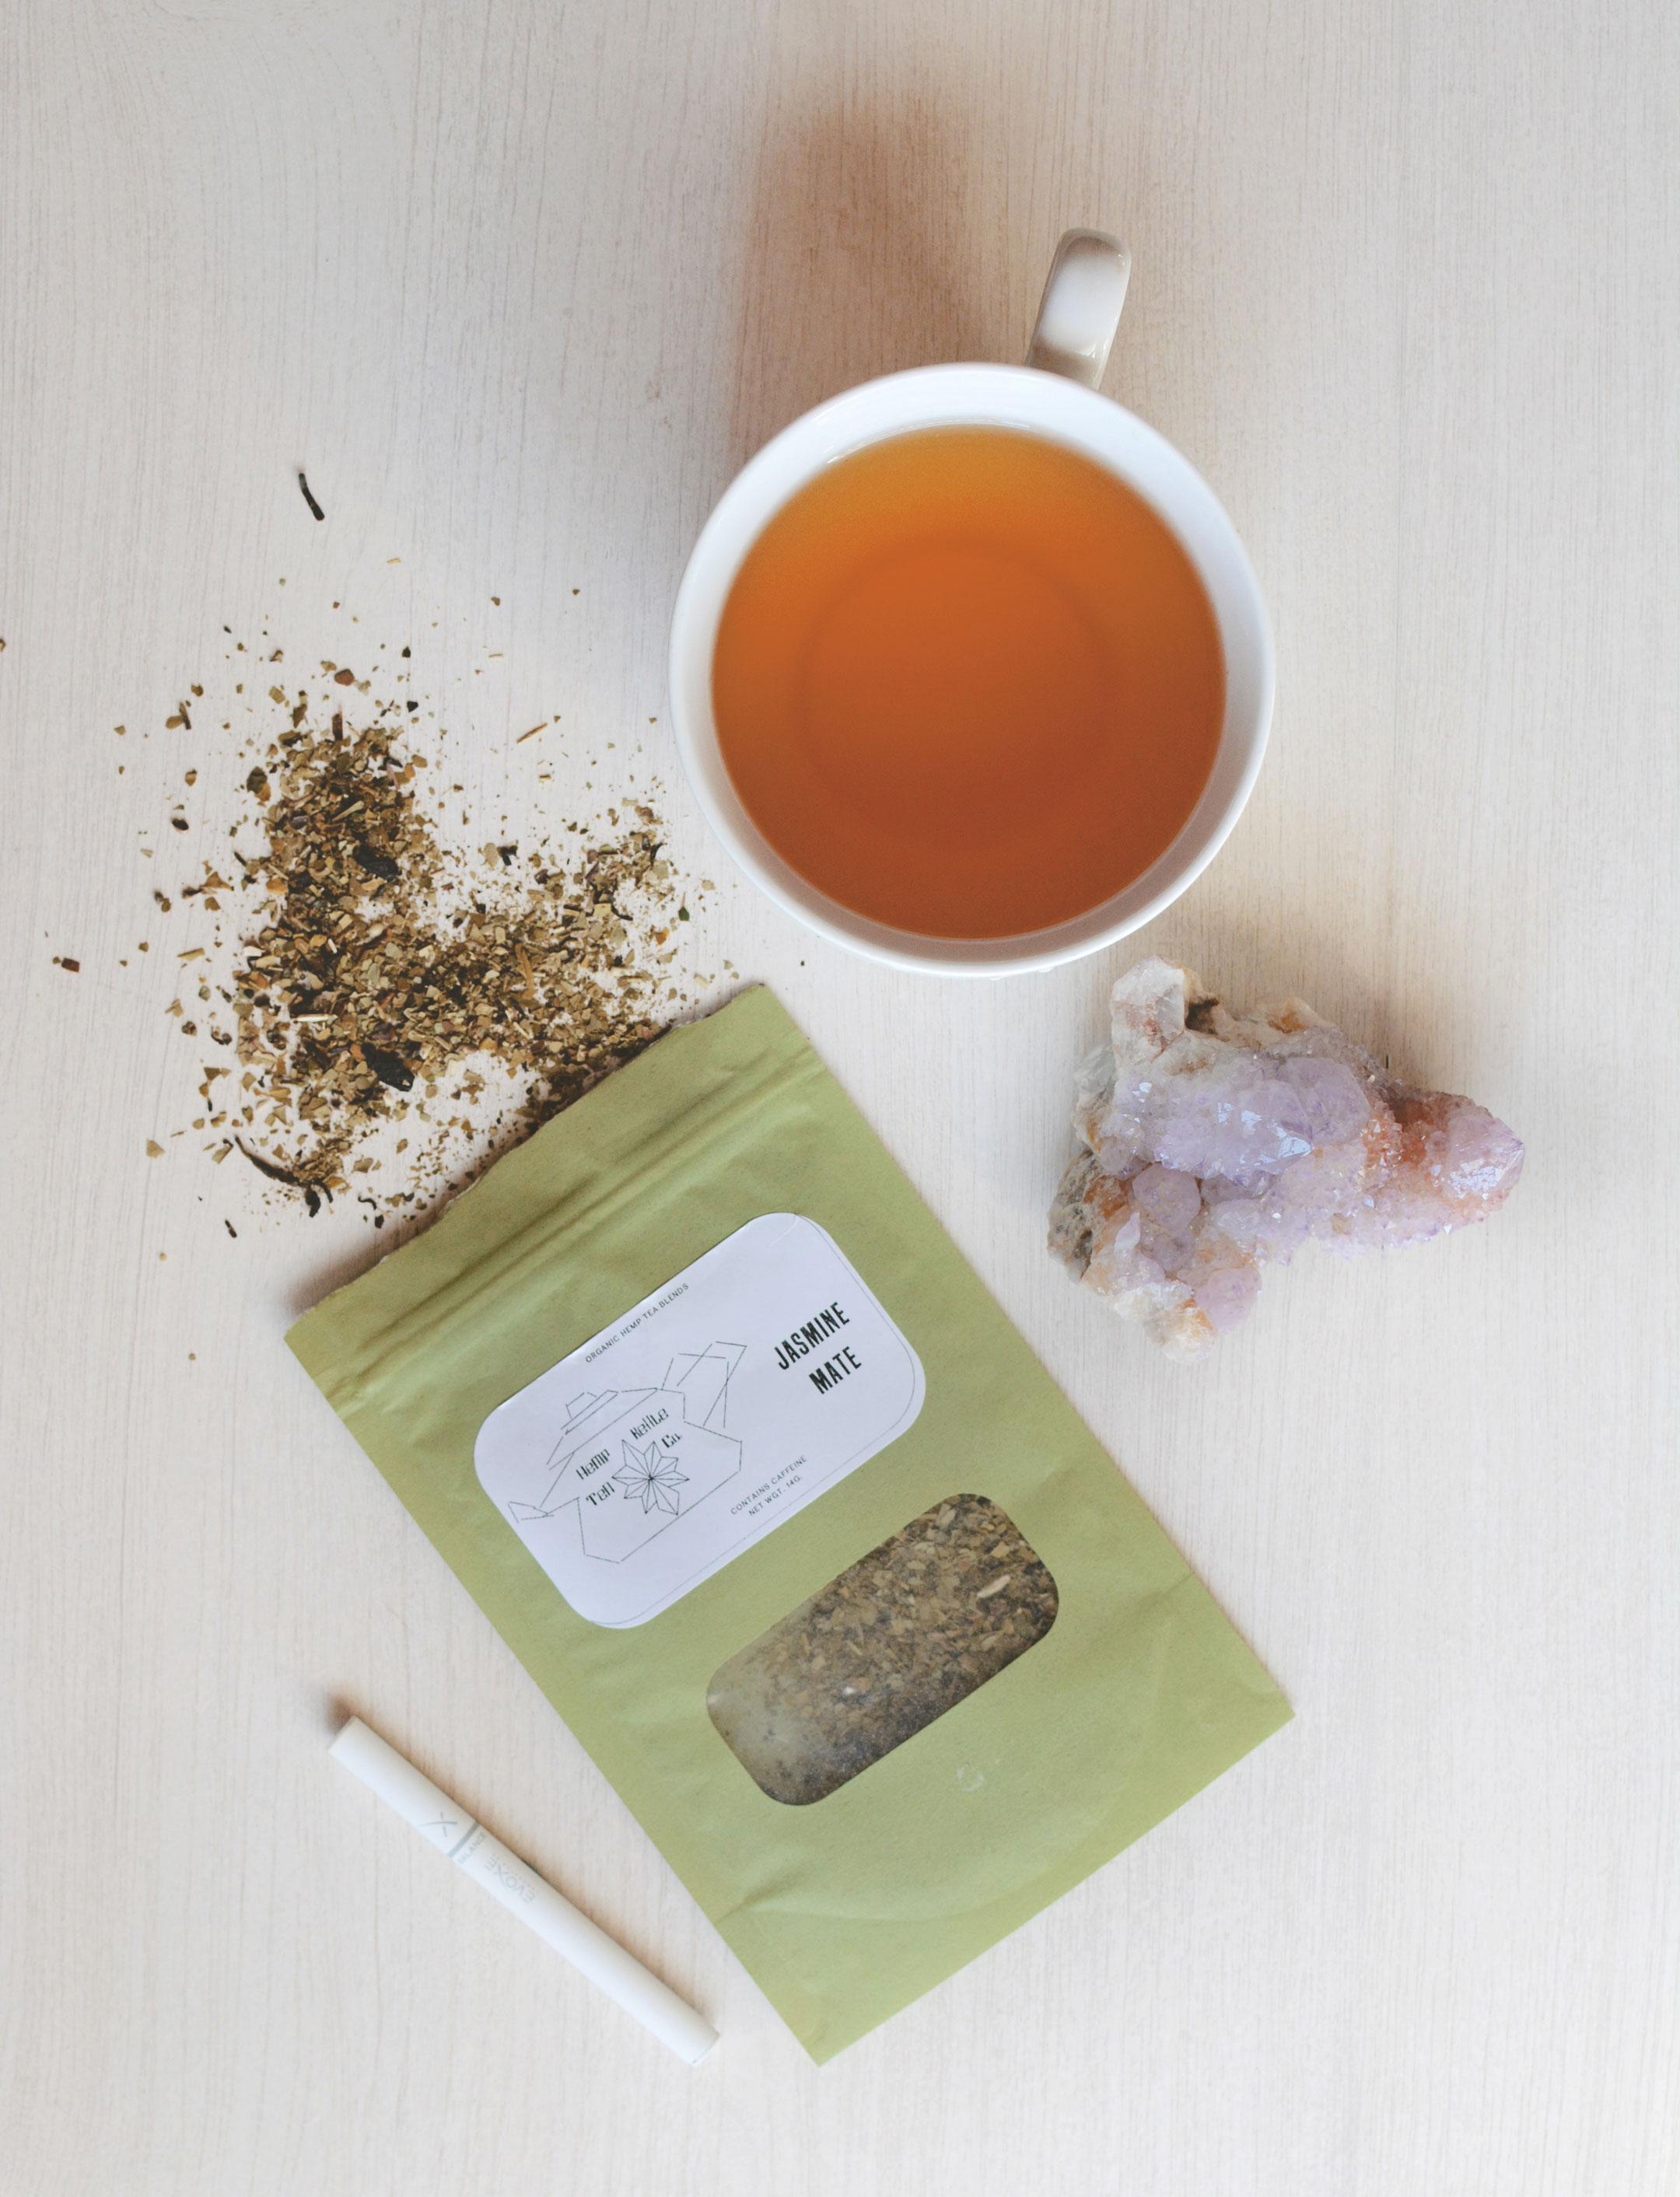 Evoxe Balance Disposable Vaporizer  (Use code KWD10 for 10% off your order!) /  Jasmine Mate Tea from Hemp Kettle Tea  /  Oversized White Mug from Target  /  Amethyst Spirit Quartz from Natural Magics